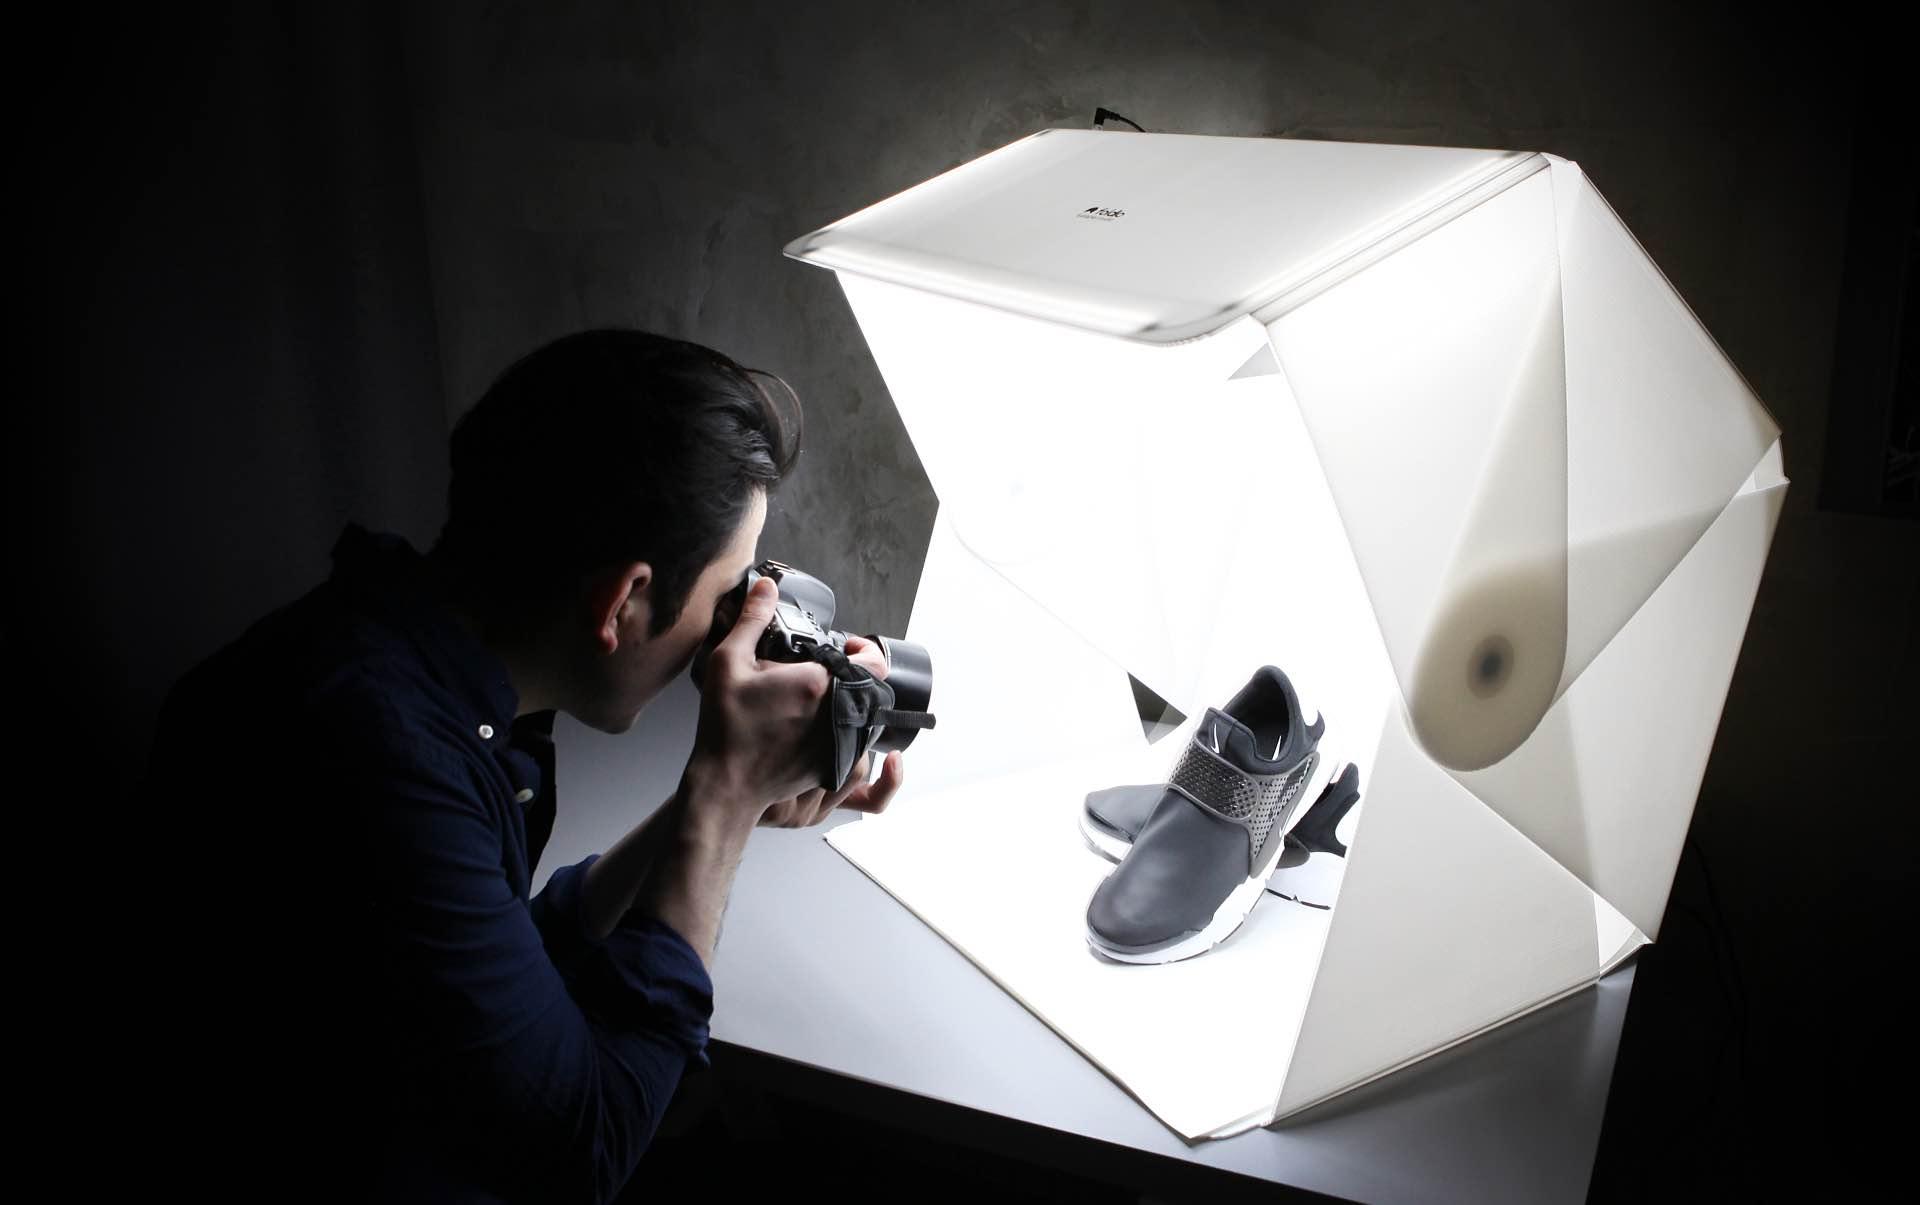 Orangemonkie Foldio3 portable photography studio. ($159)